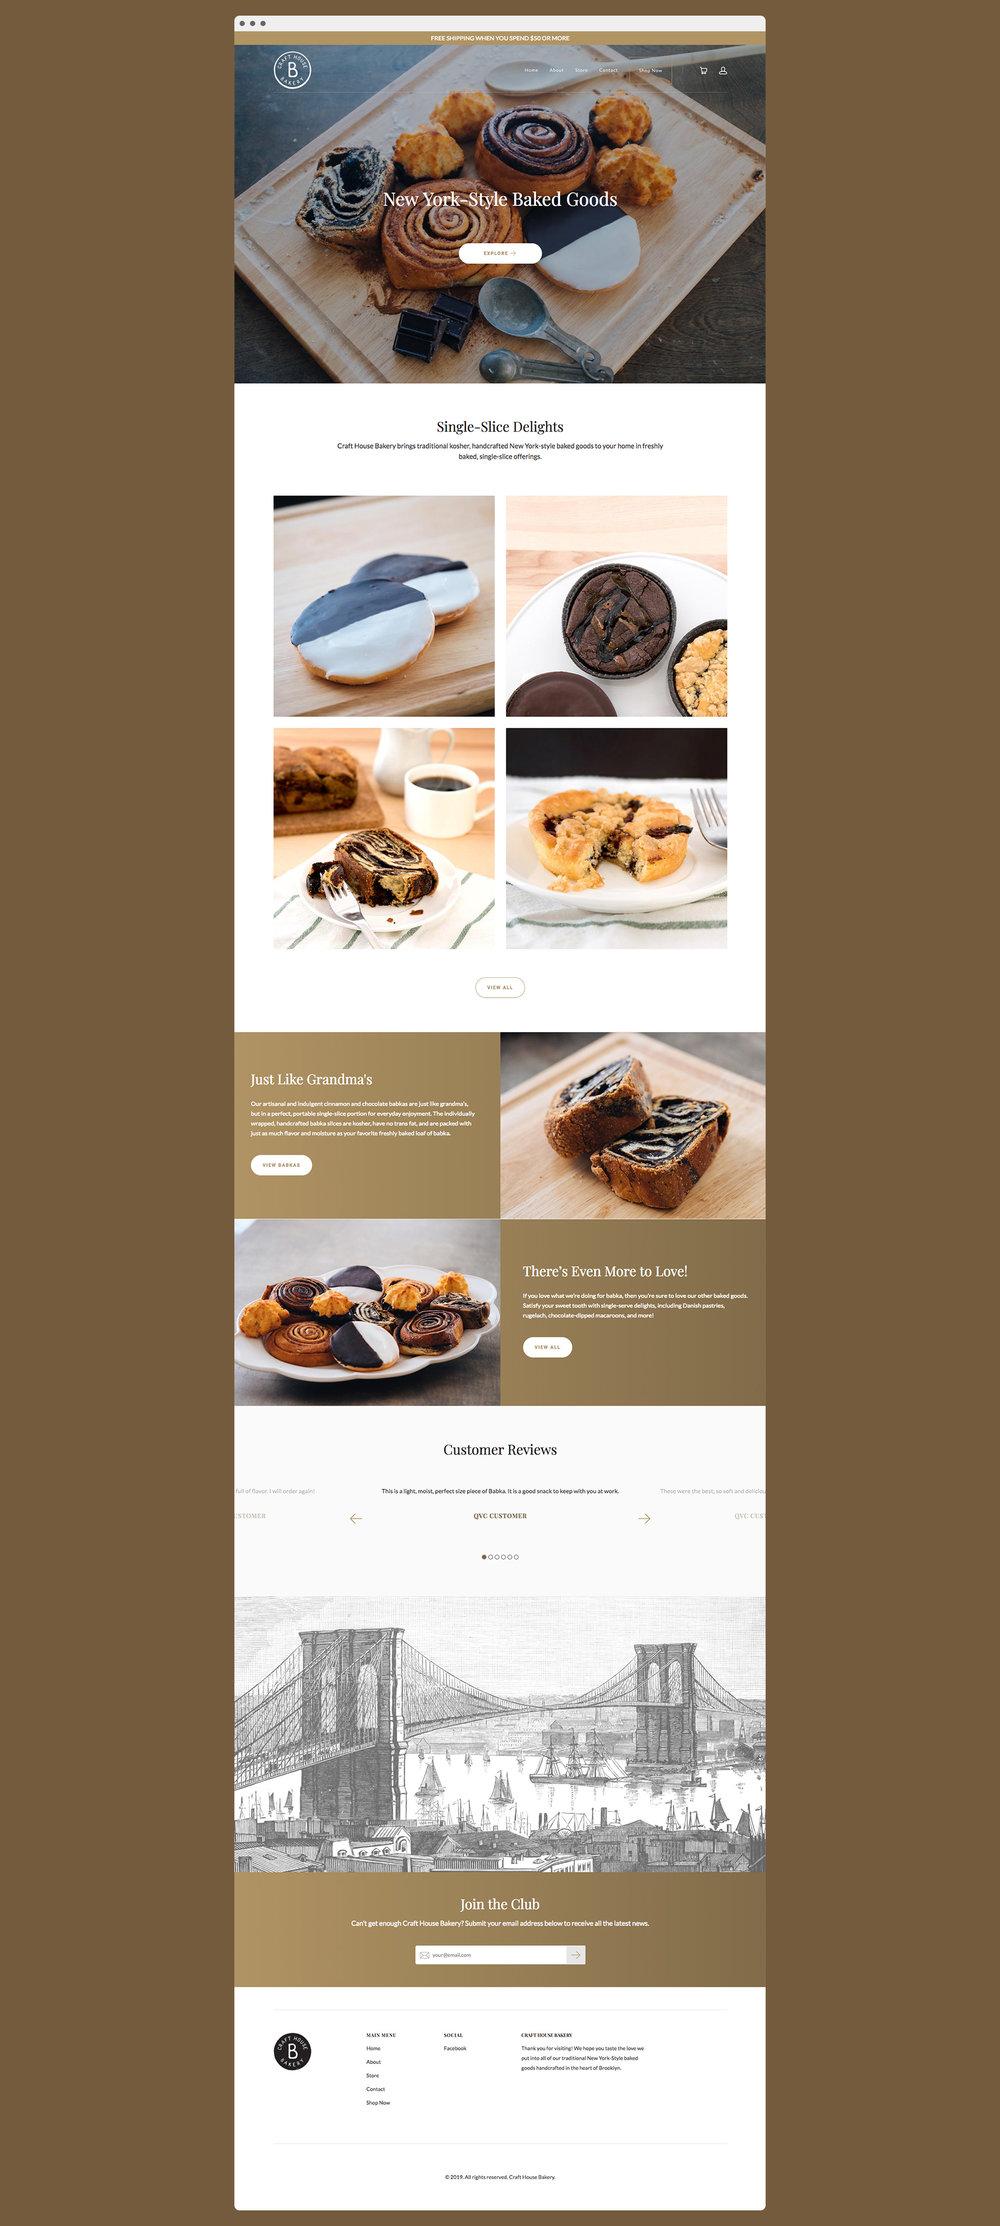 crafthousebakery_1920x1080-website-home.jpg